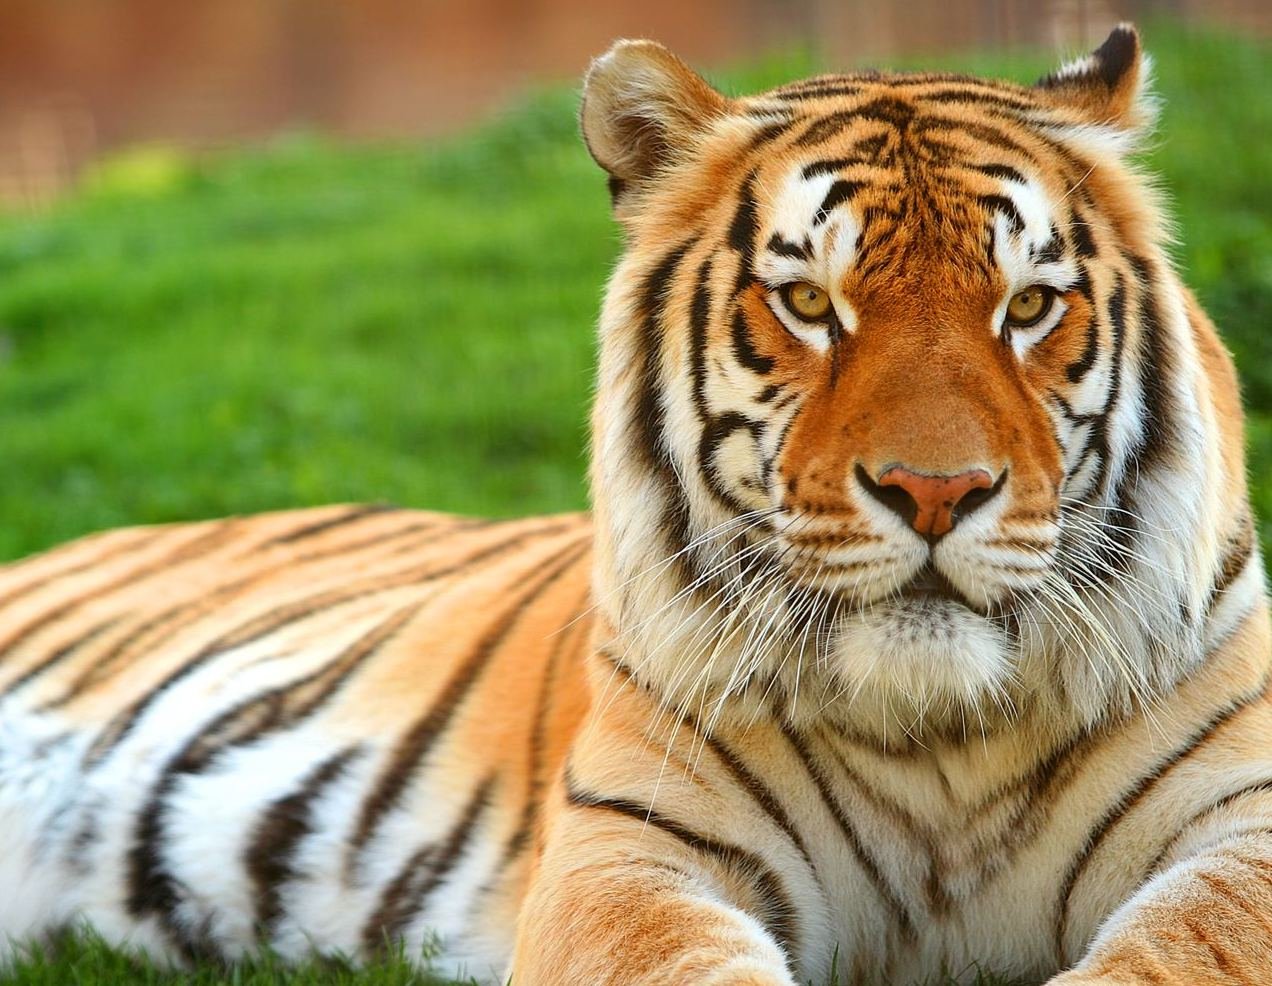 Tiger Hd Wallpapers: Online Wallpapers Shop: Free Tiger Wallpaper, Desktop